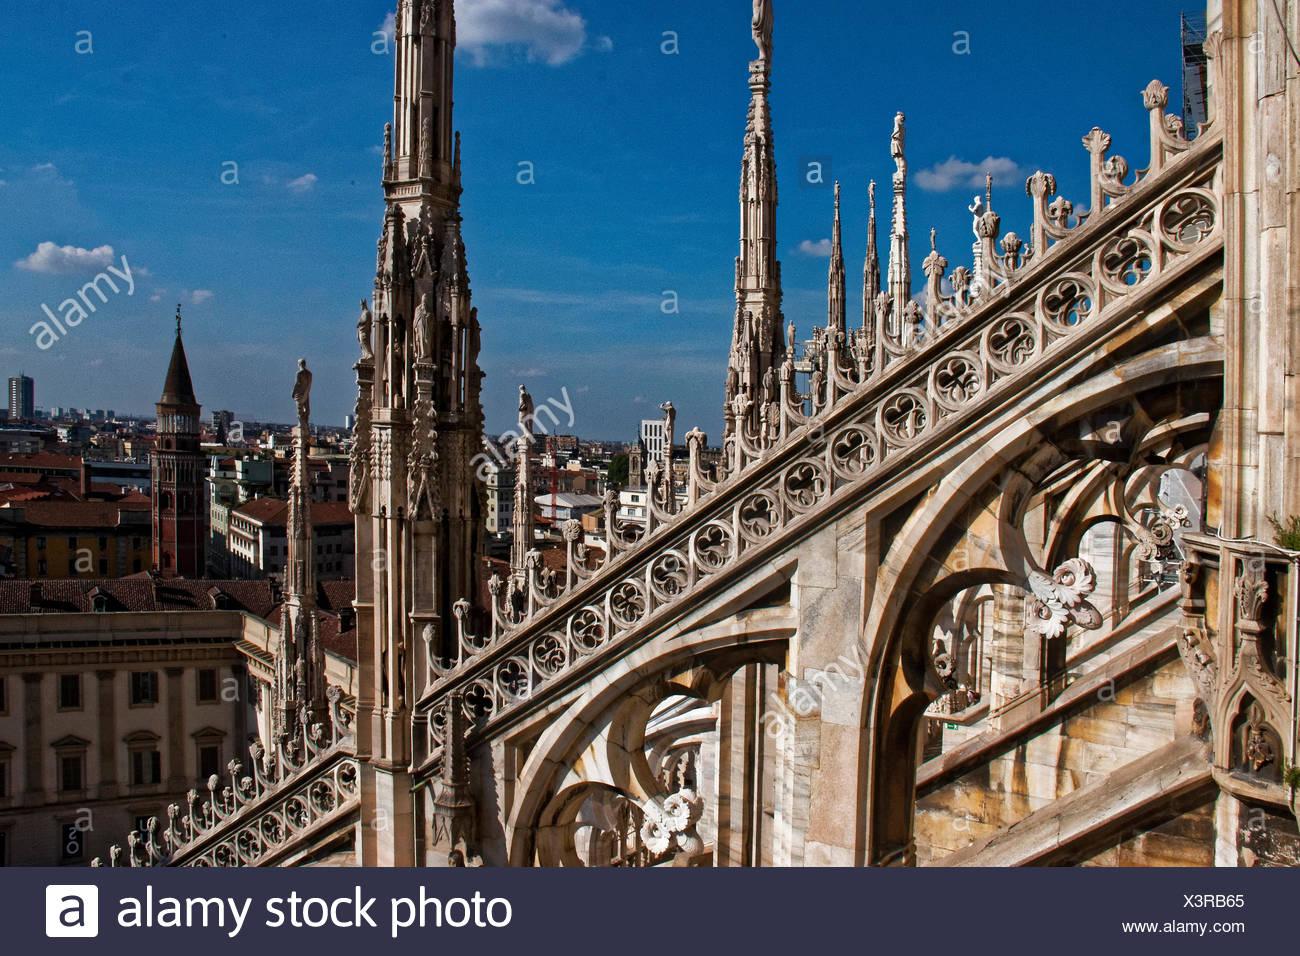 Milano duomo spires - Stock Image